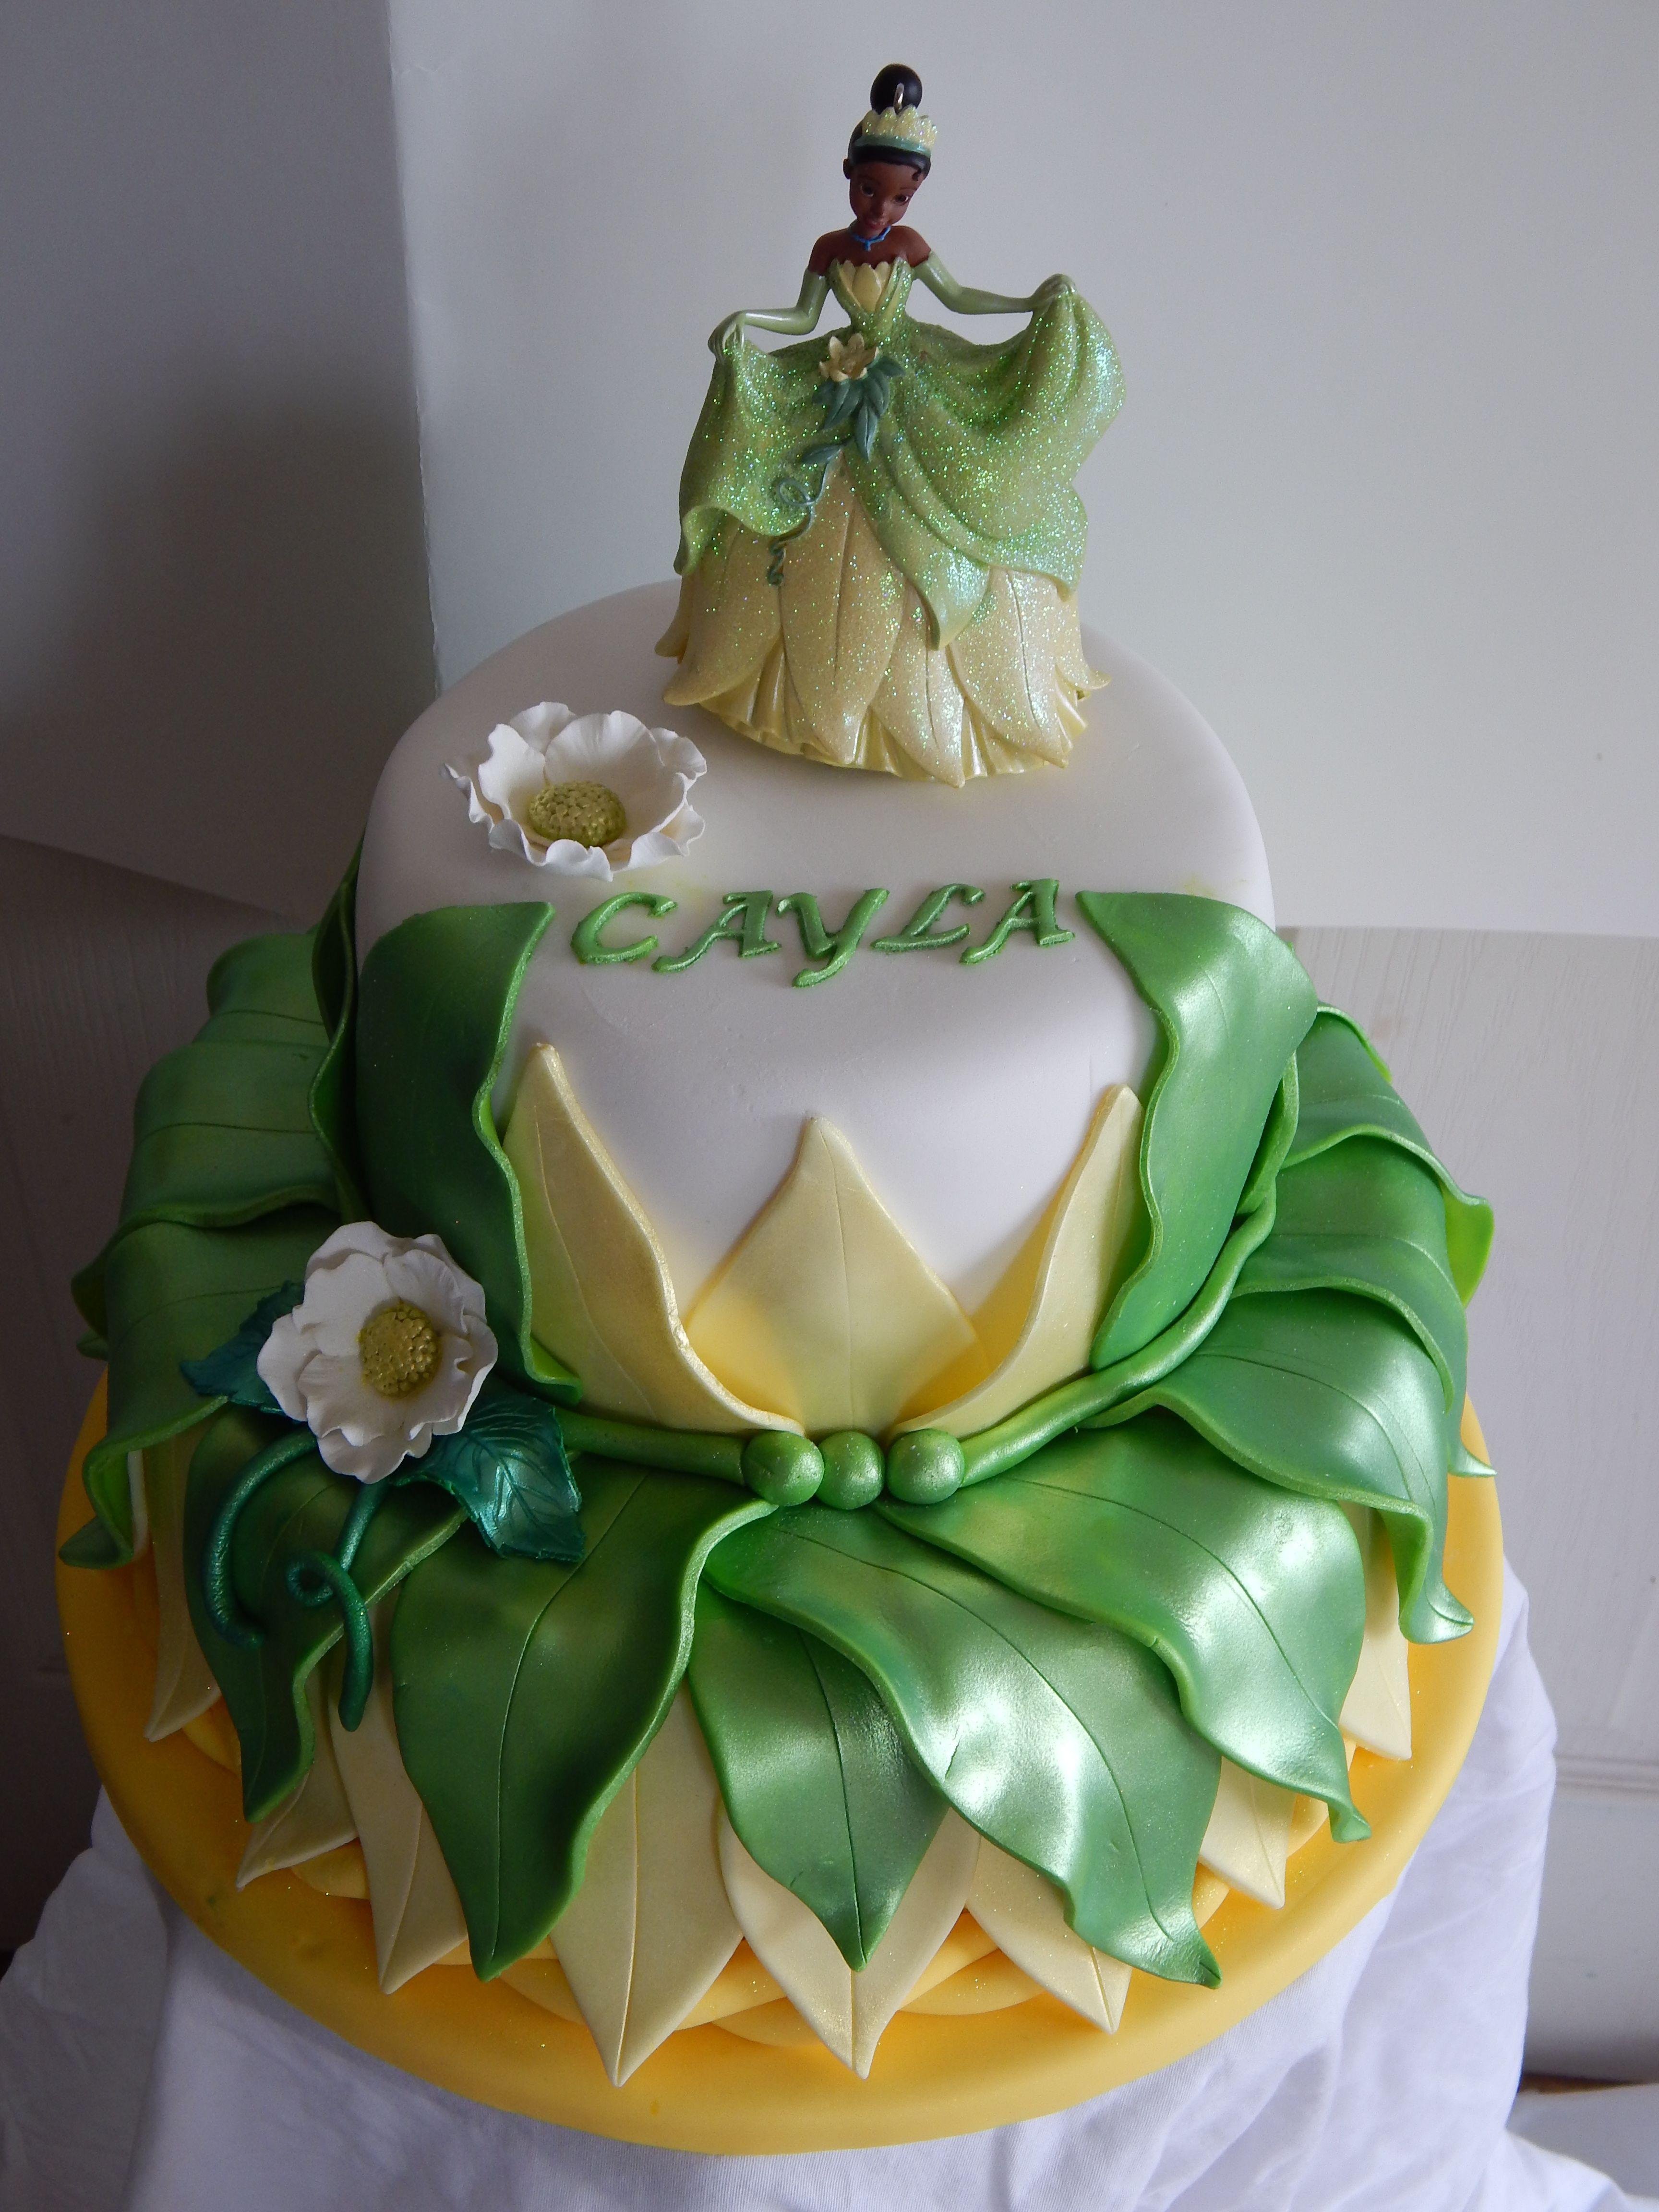 Princess Tiana Cake For Birthday Bash In Oshawa Disney Princess